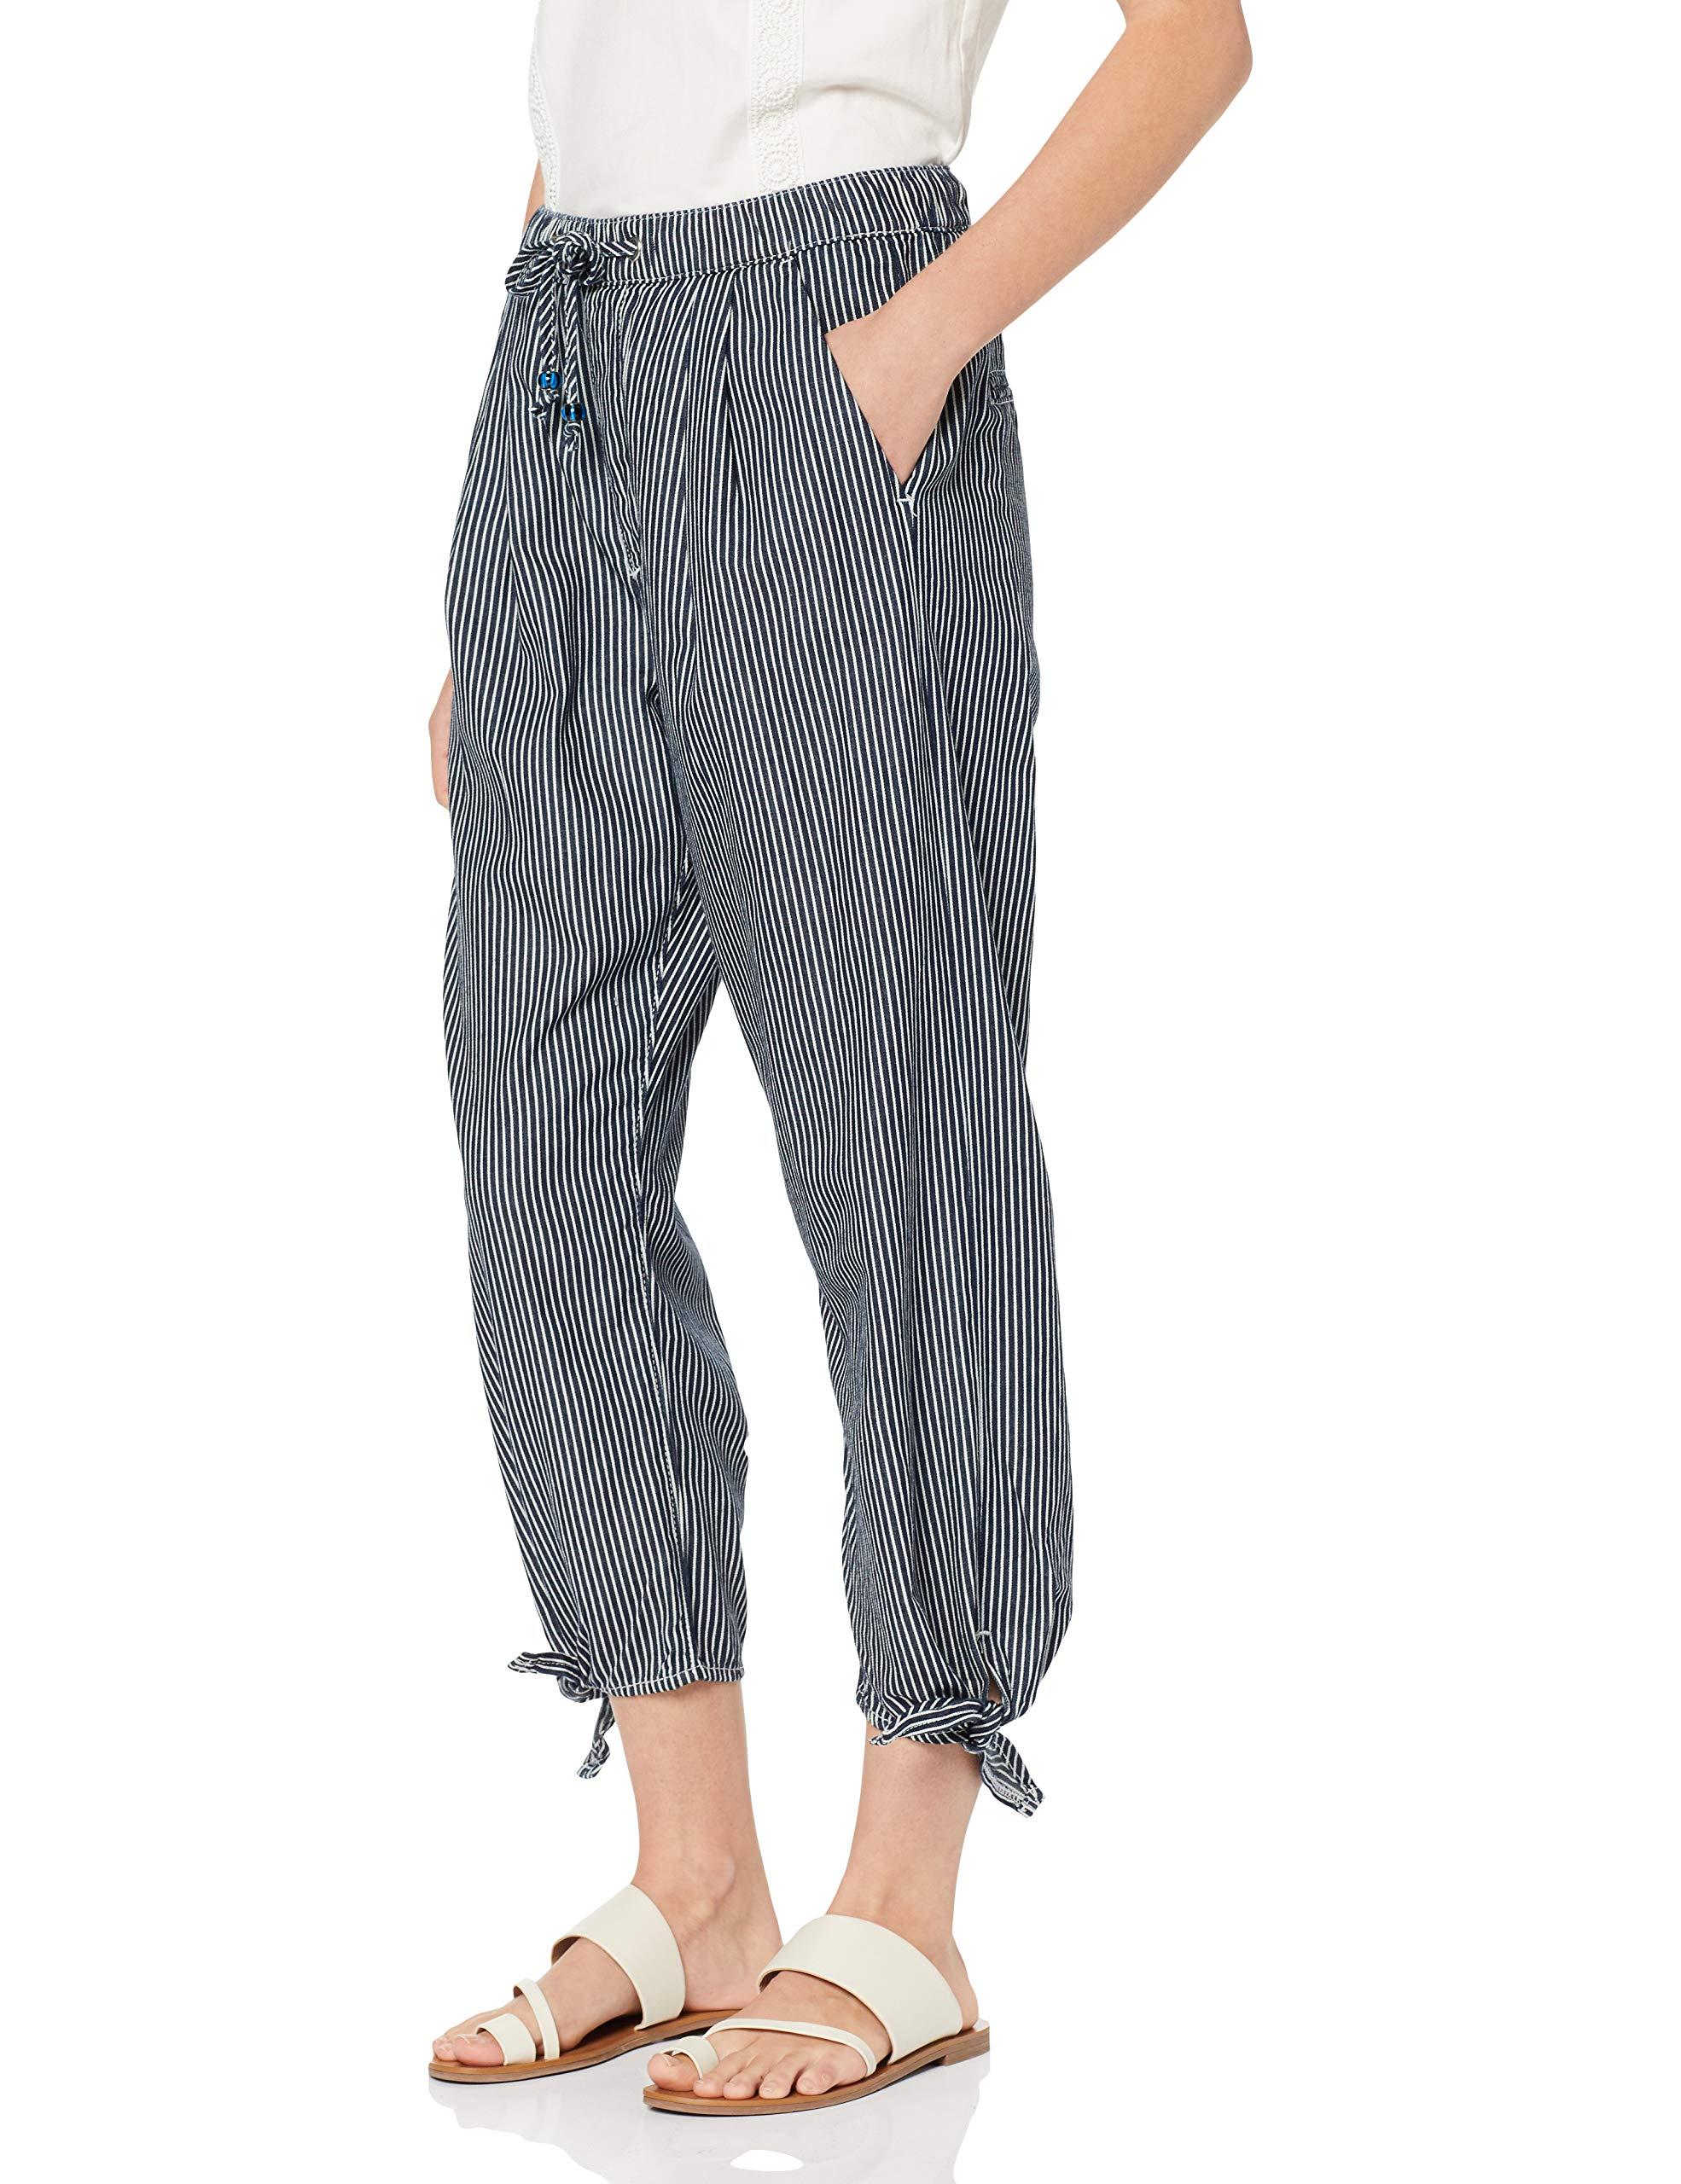 Deena Pl203421 000W27 Pepe regularFemme w27 PantalonBleu8oz Denim Indigo l32taille Jeans Stripe Fabricant 5Aj34RL